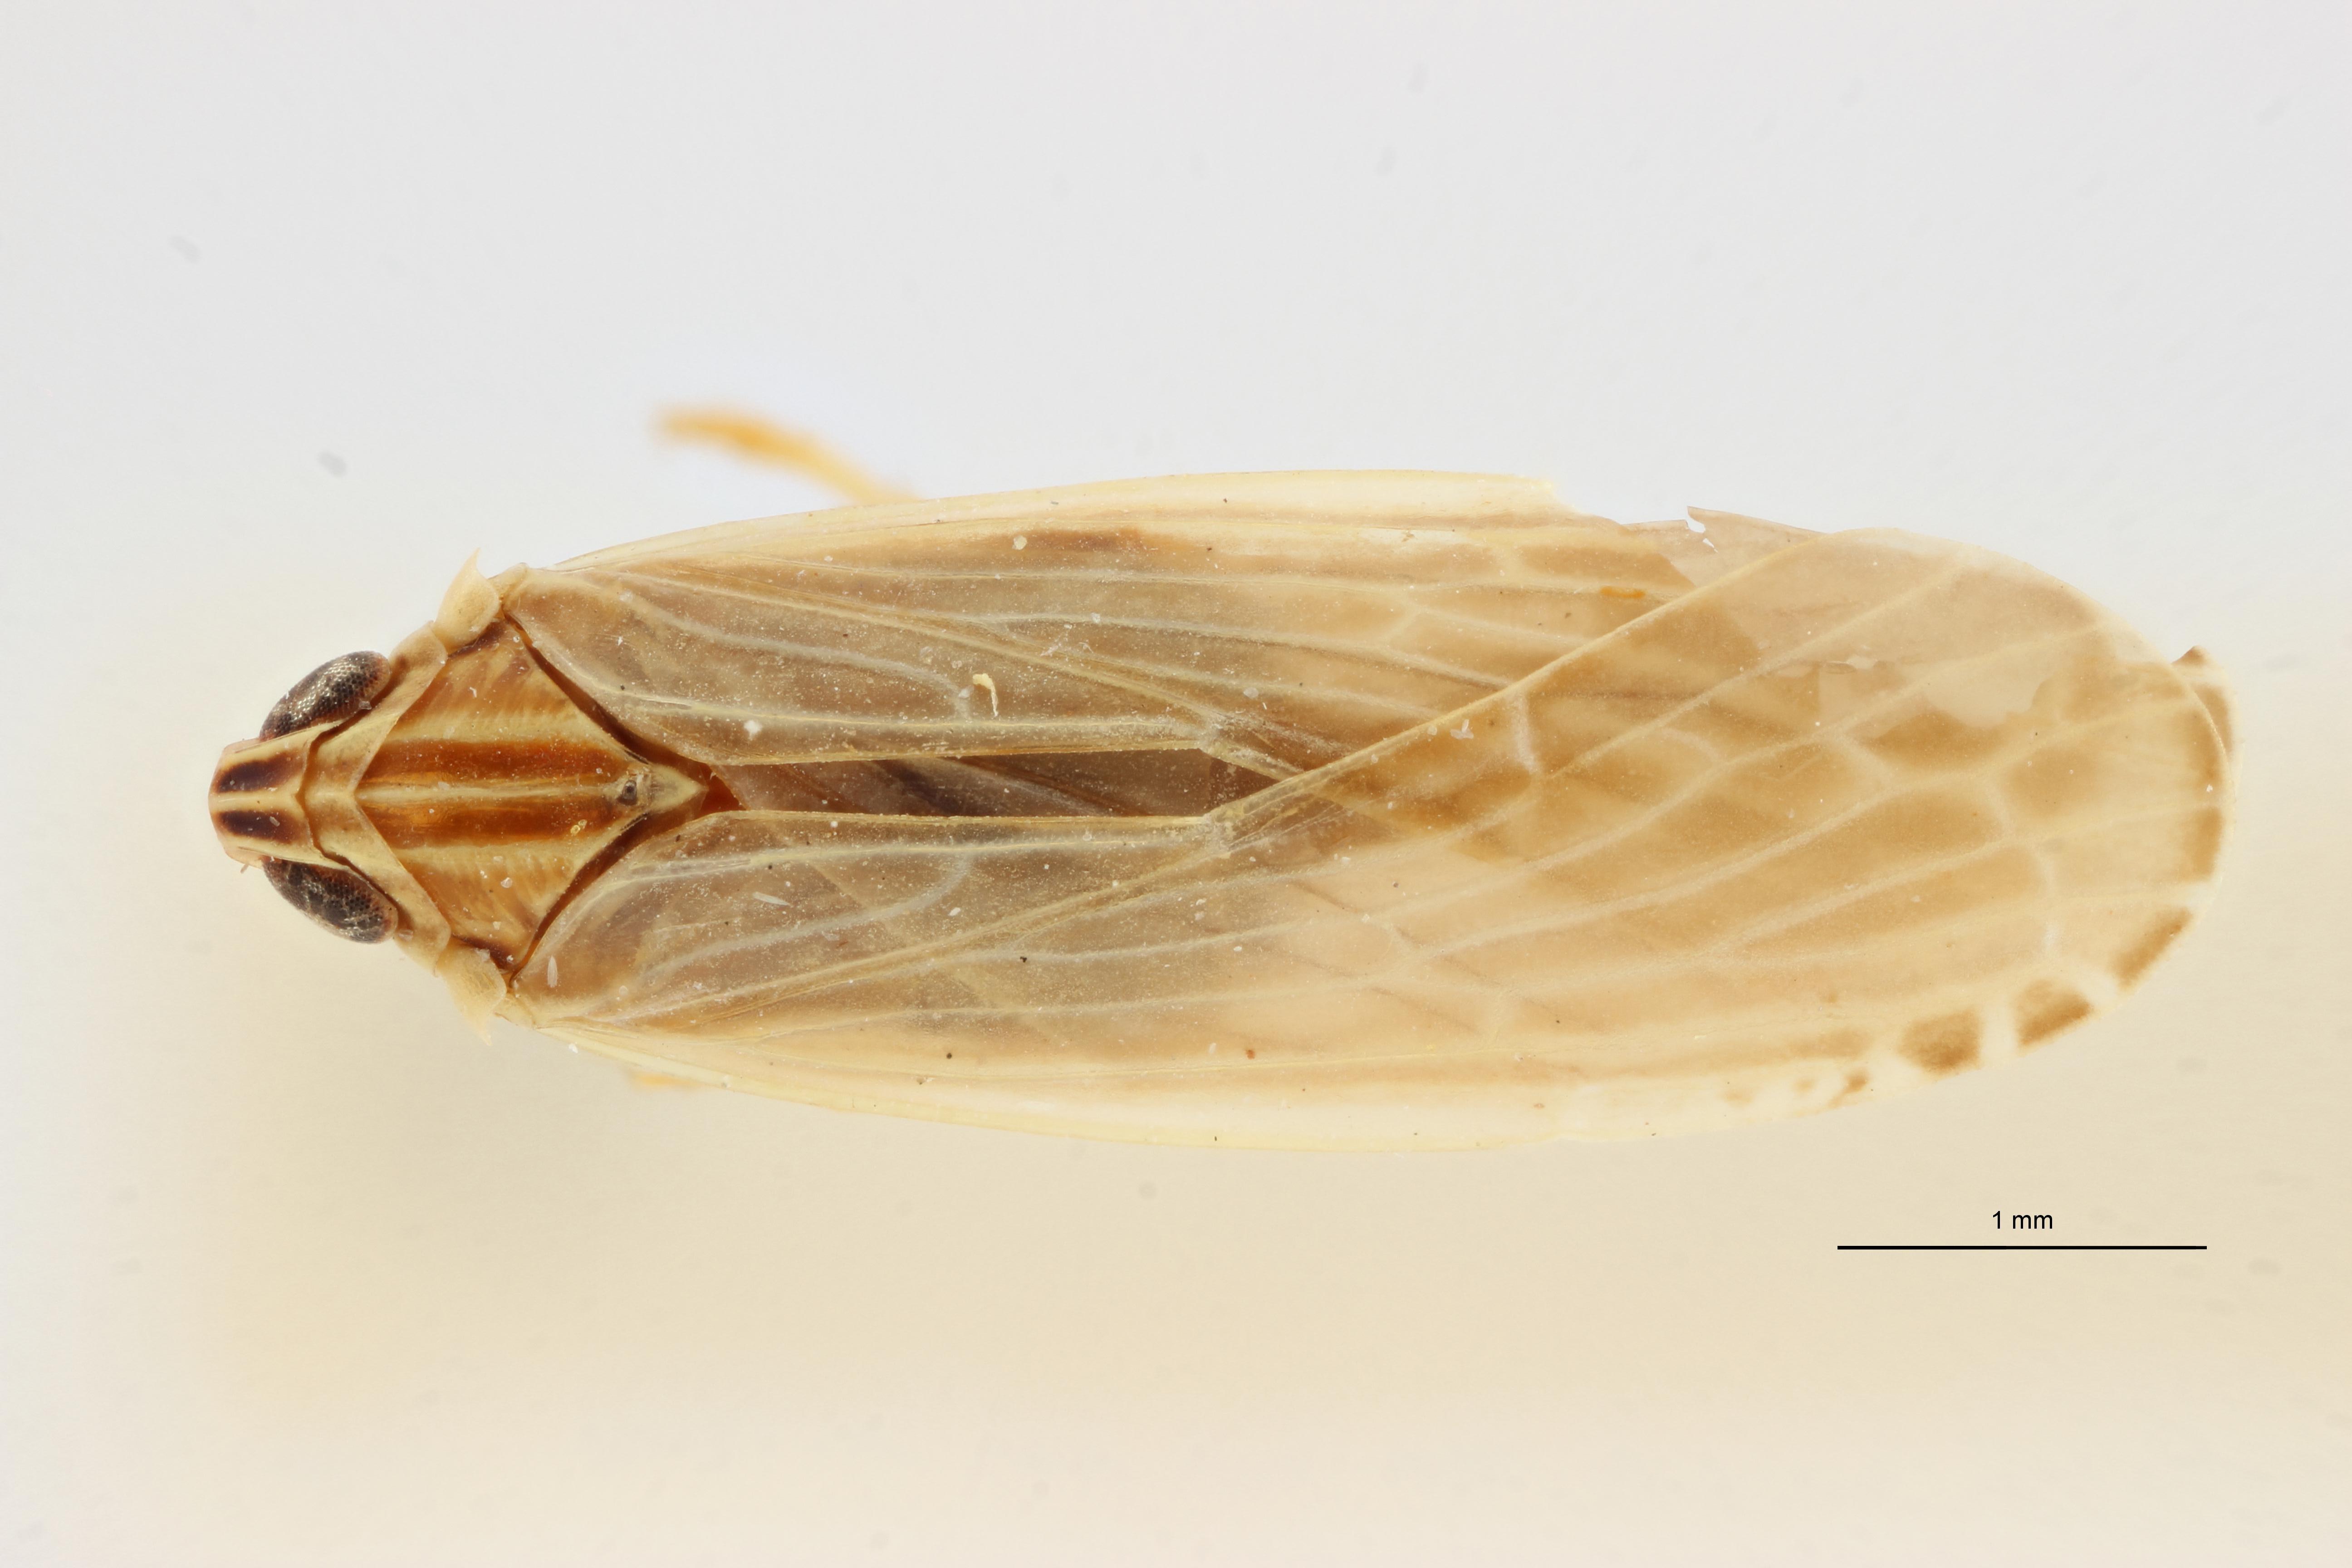 Ballomarius kabashensis pt2 D ZS PMax Scaled.jpeg